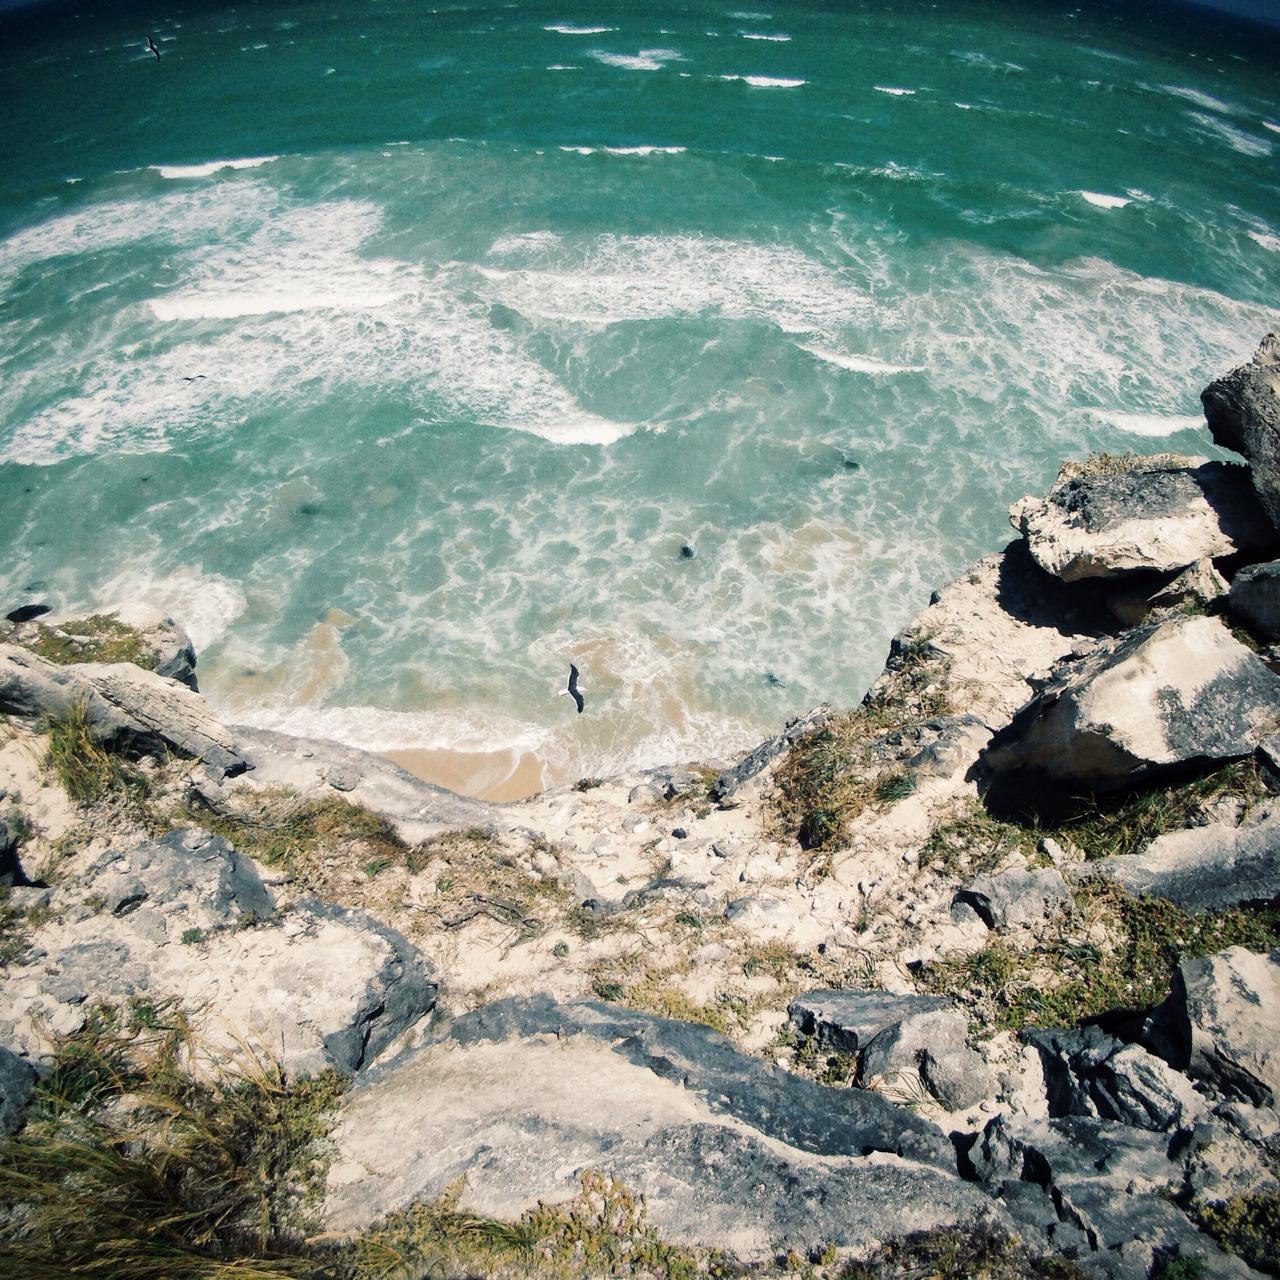 Sea Gulls & Ocean Breaks || #SummerGoesBos #CapeTown